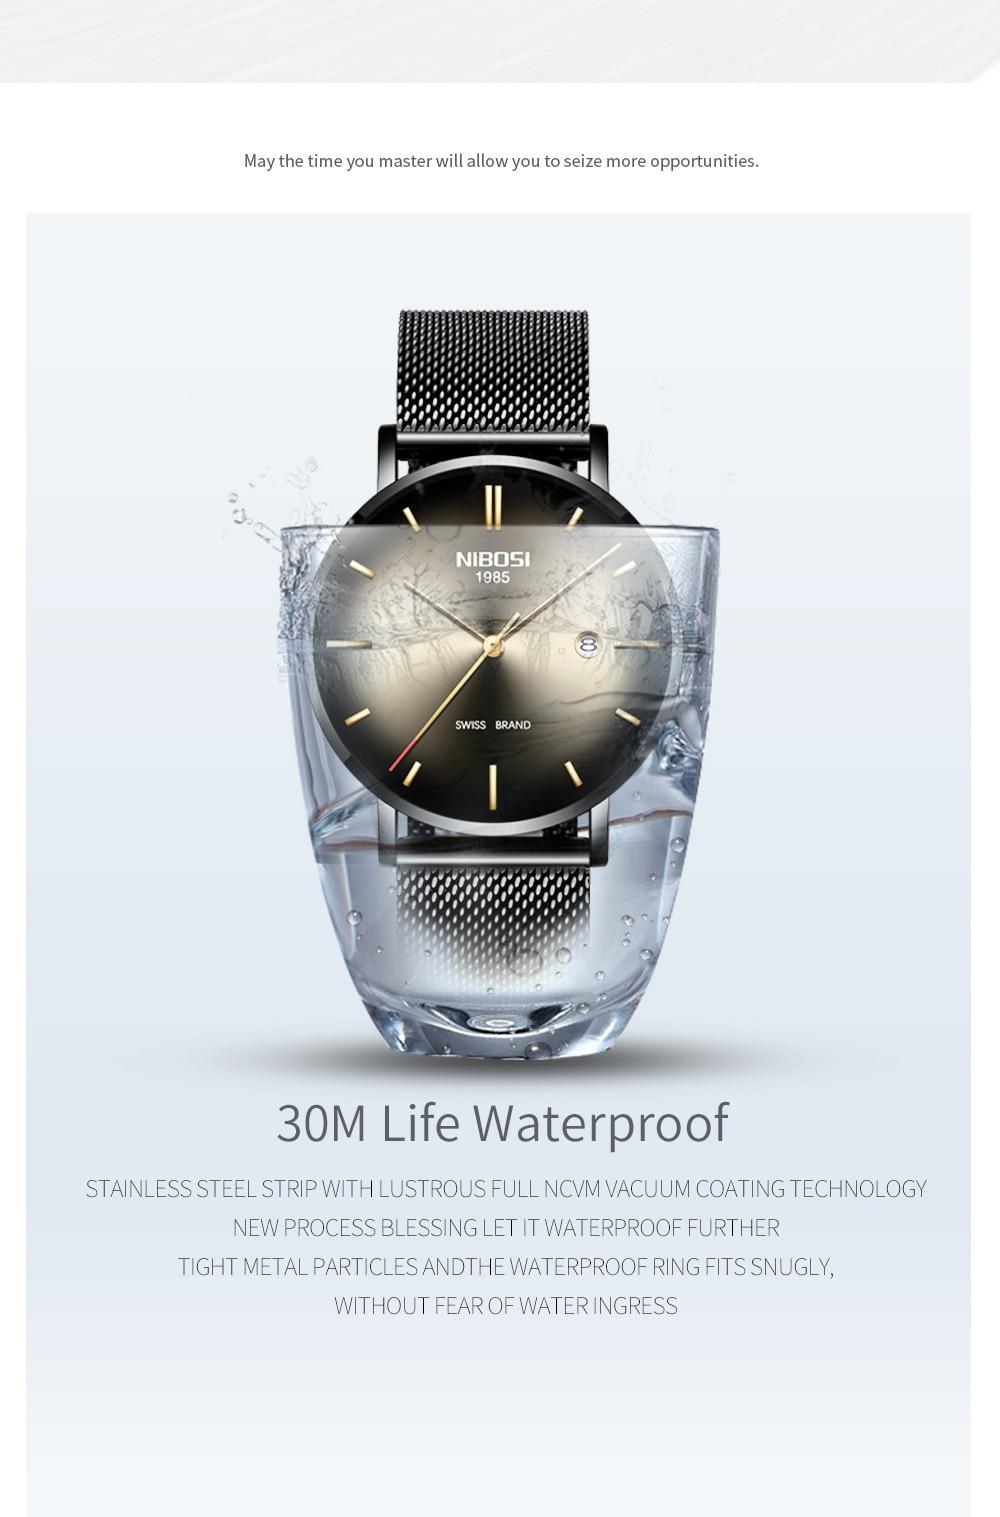 HTB1466FaE rK1Rjy0Fcq6zEvVXaX NIBOSI Watch Men Simple Fashion Swiss Brand Quartz Watch Luxury Creative Waterproof Date Casual Men Watches Relogio Masculino